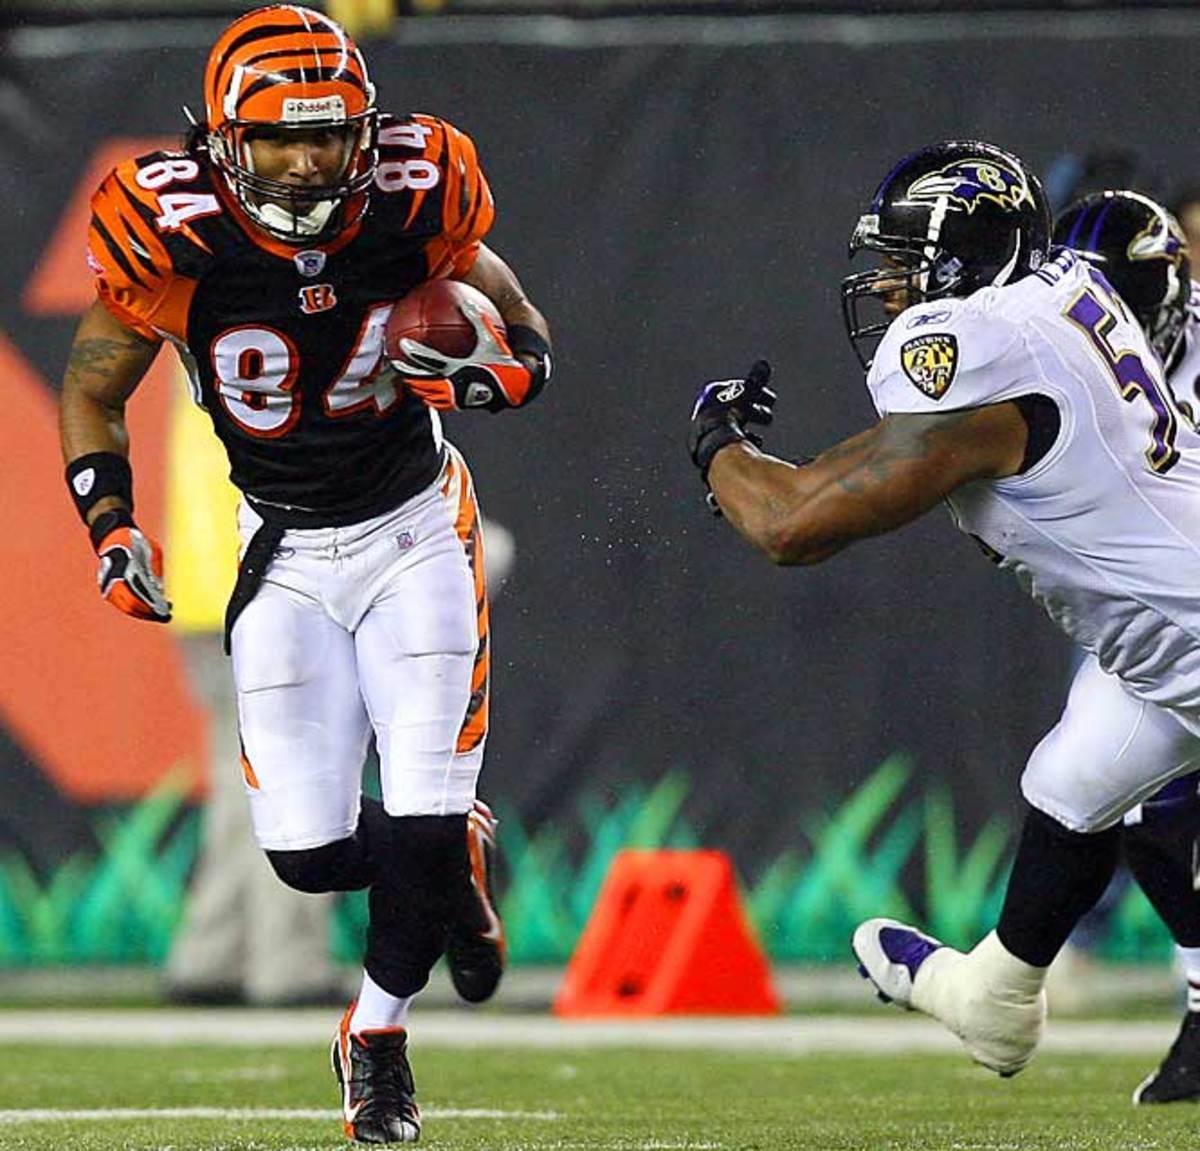 Bengals 13, Ravens 7